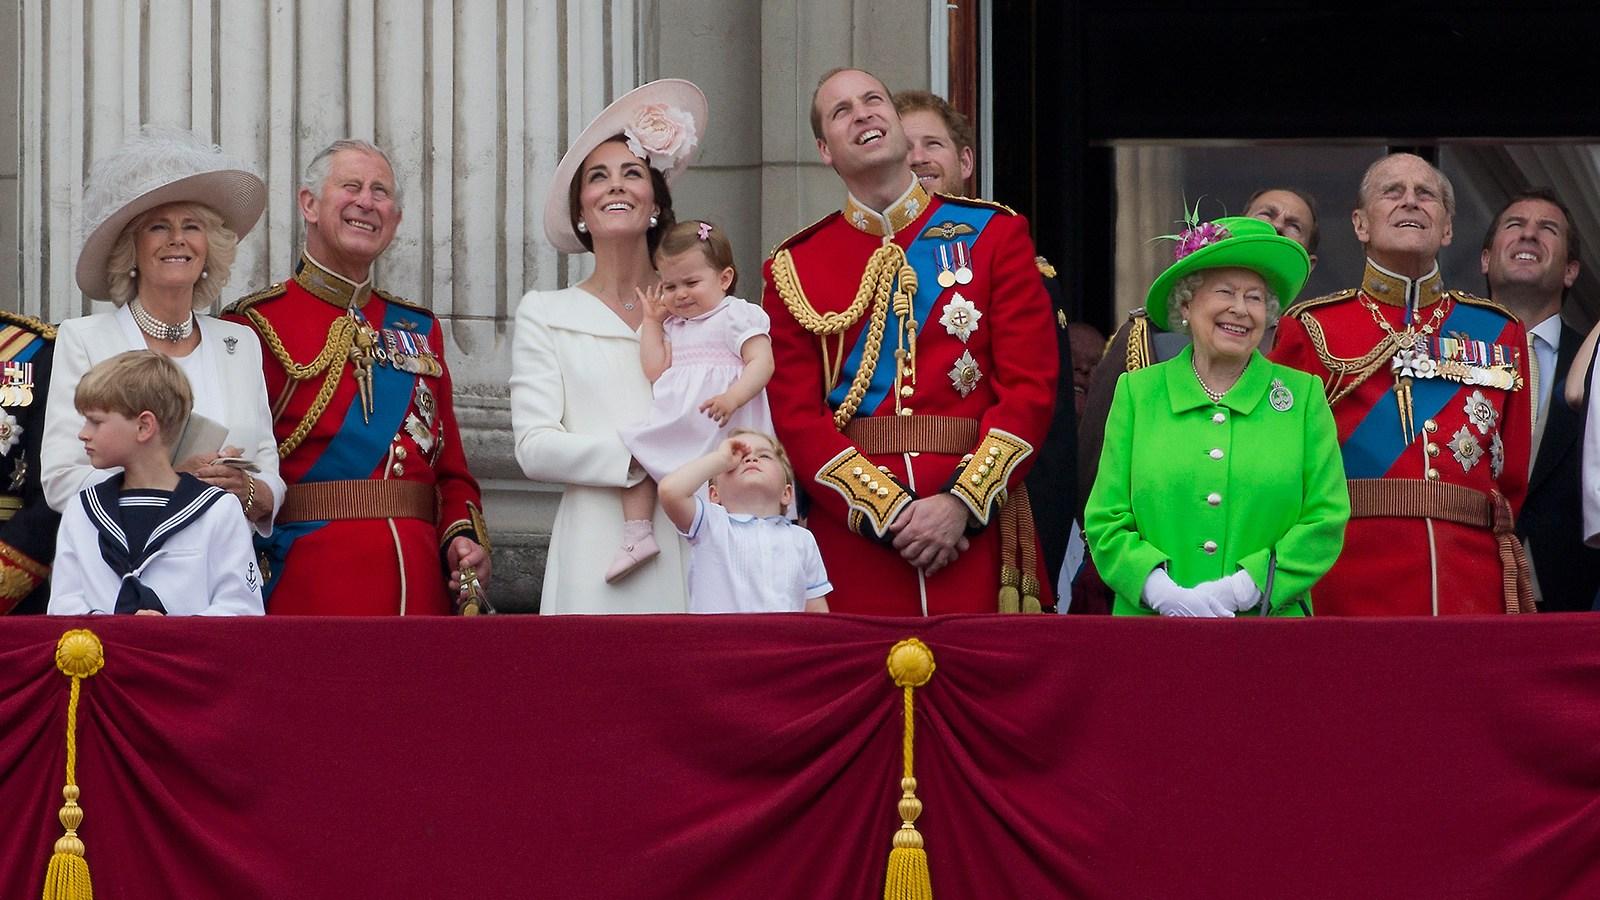 Queen Elizabeth, Prince William, Princess Charlotte, Princess kate,